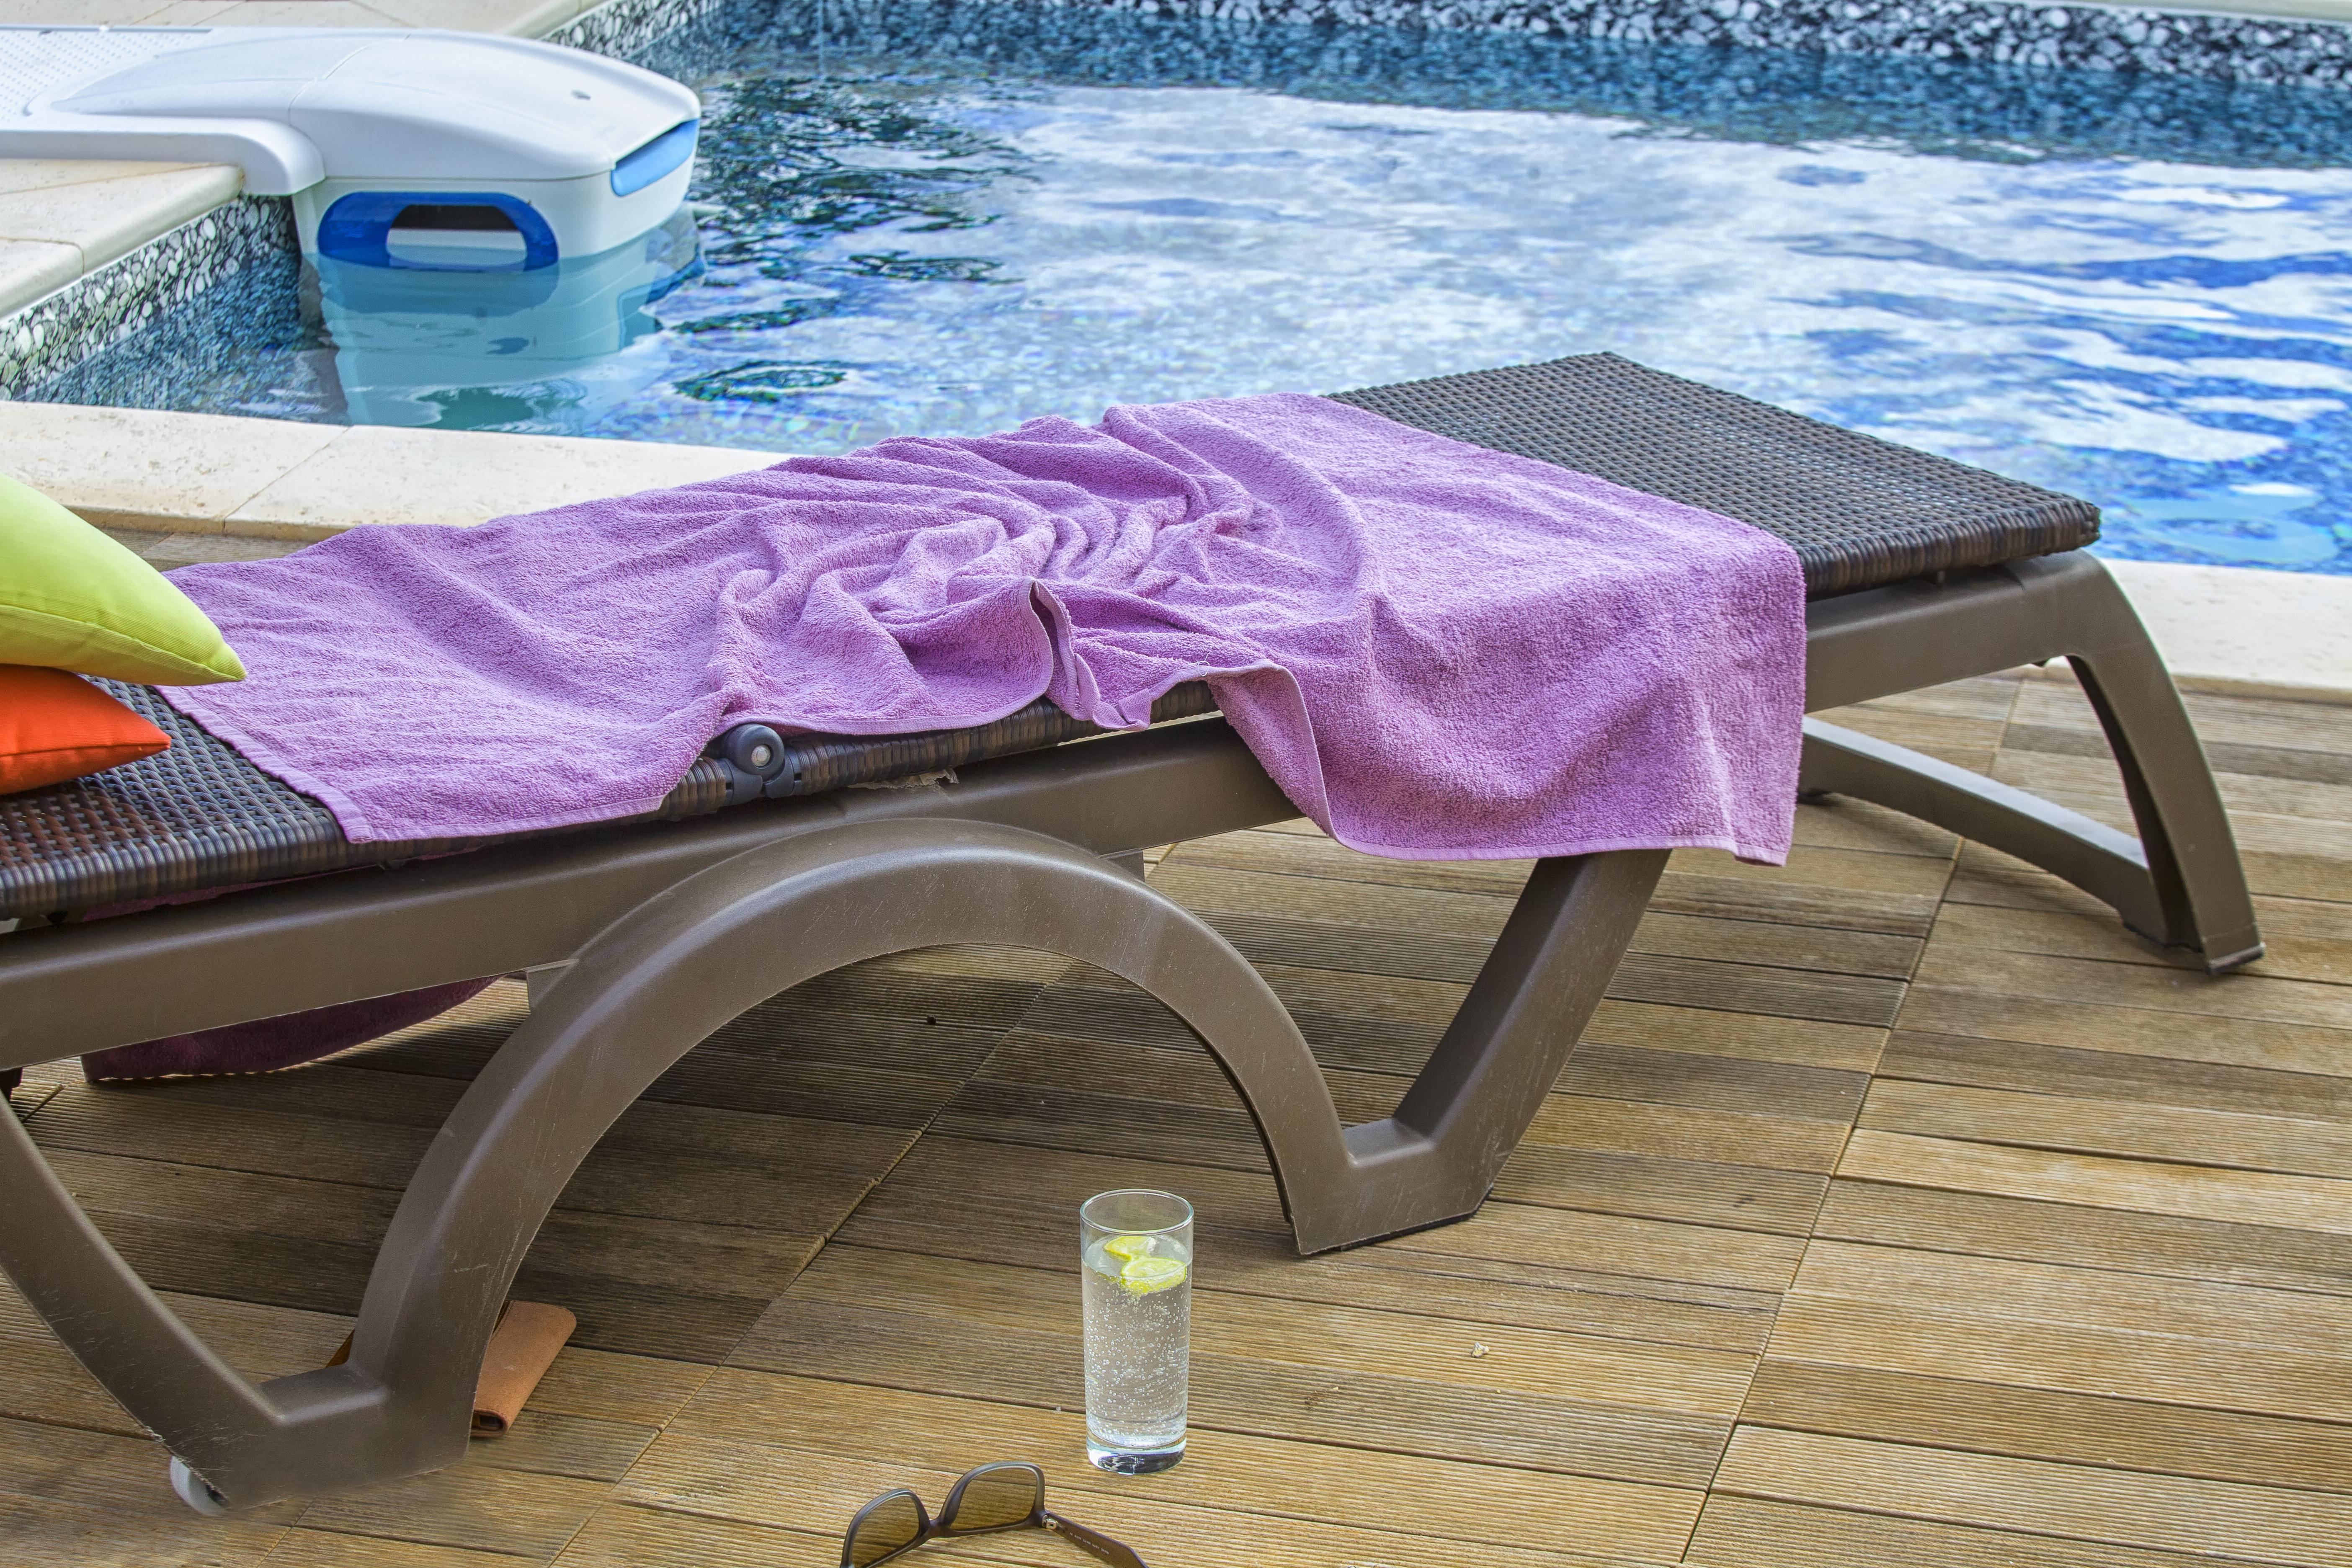 Resort hotel towel.